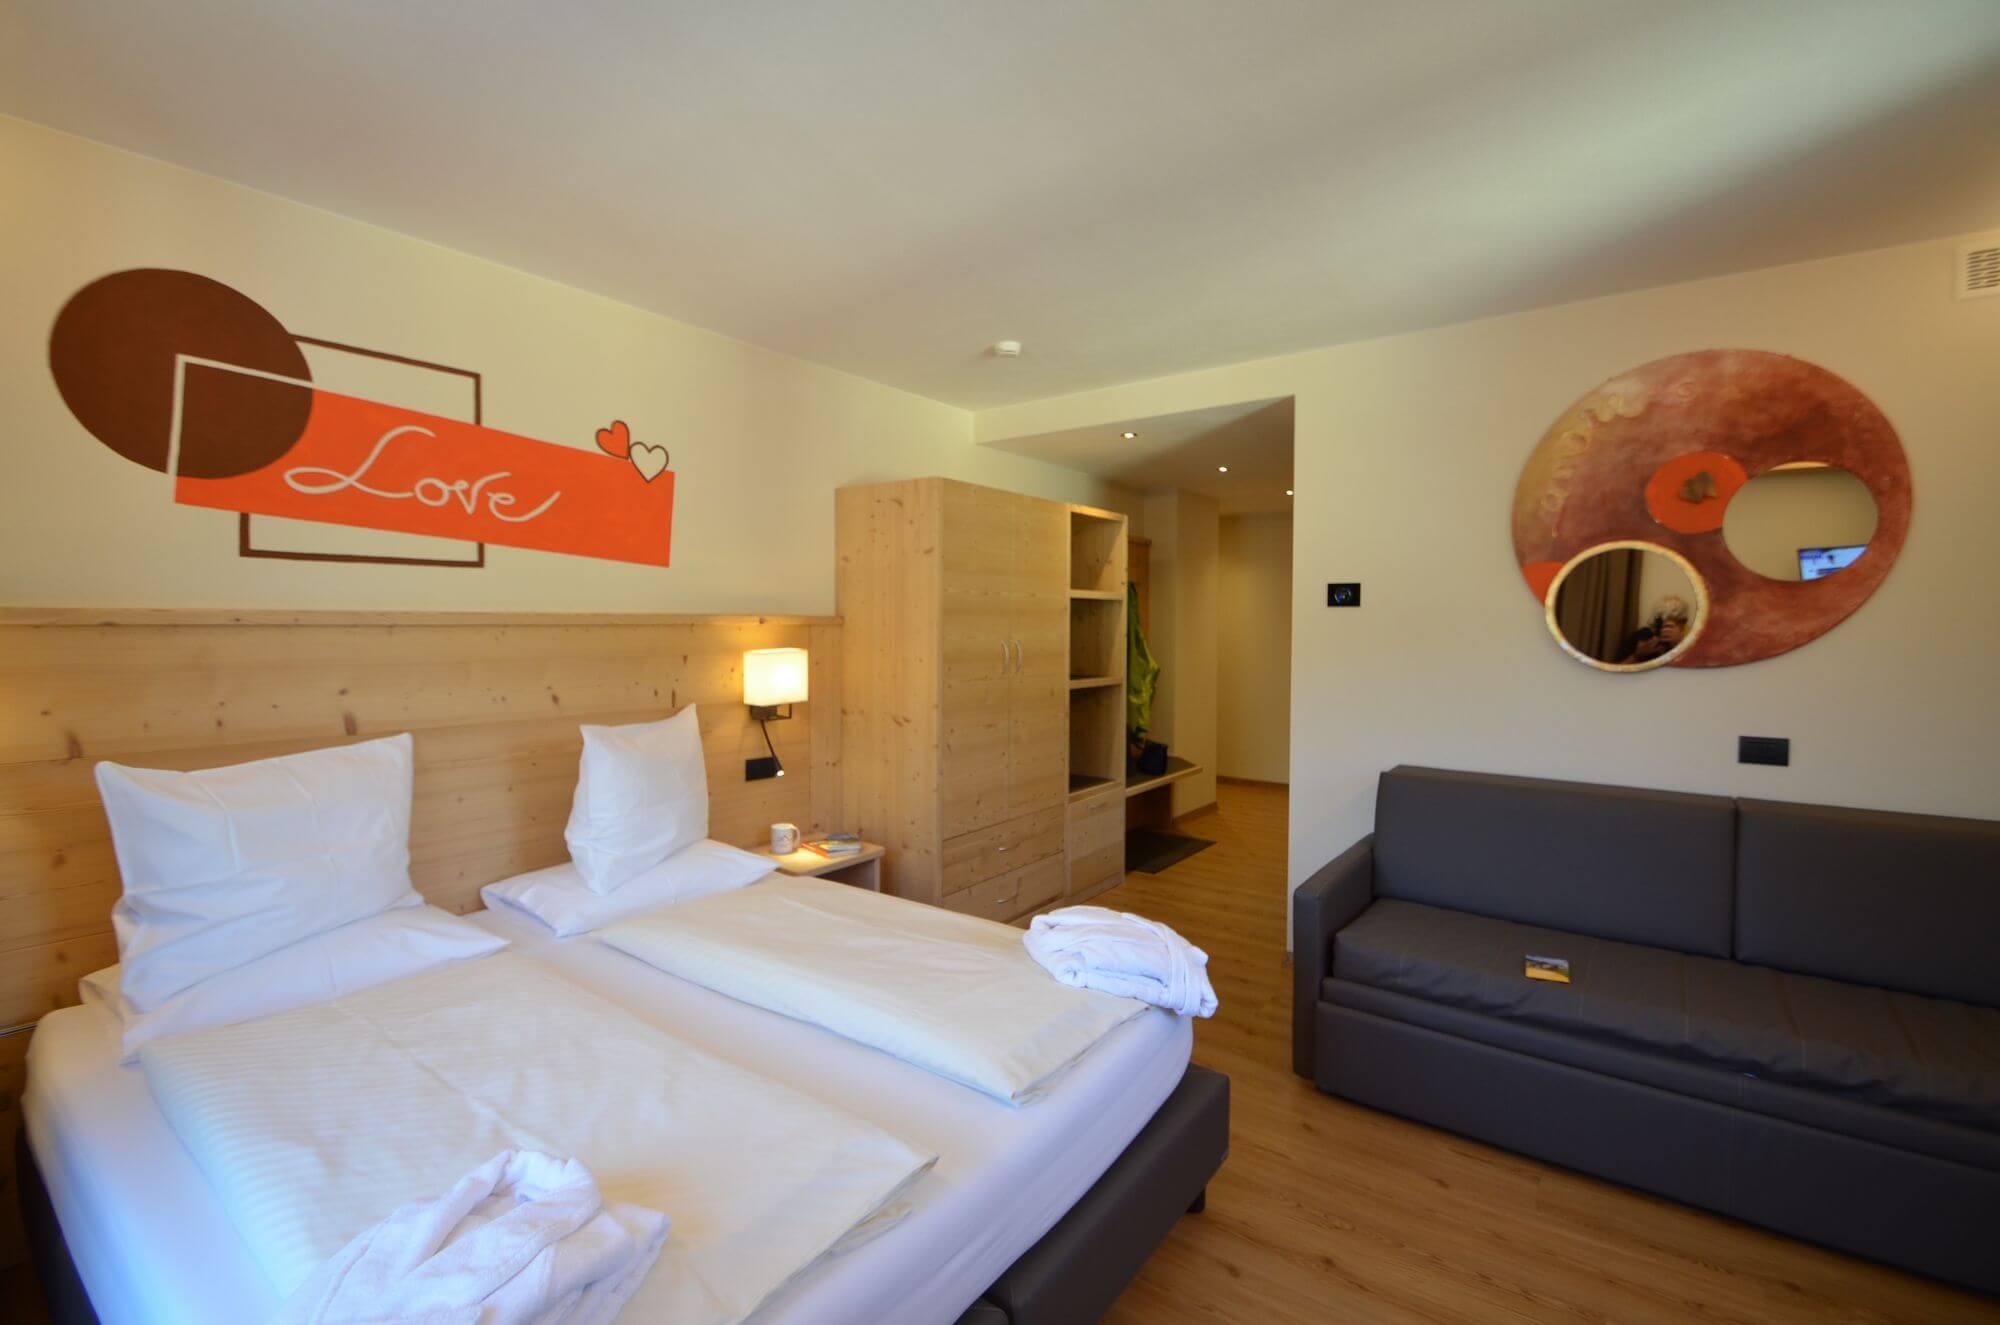 Vista d'insieme sulla Junior Suite: Hotel Le Alpi a Livigno